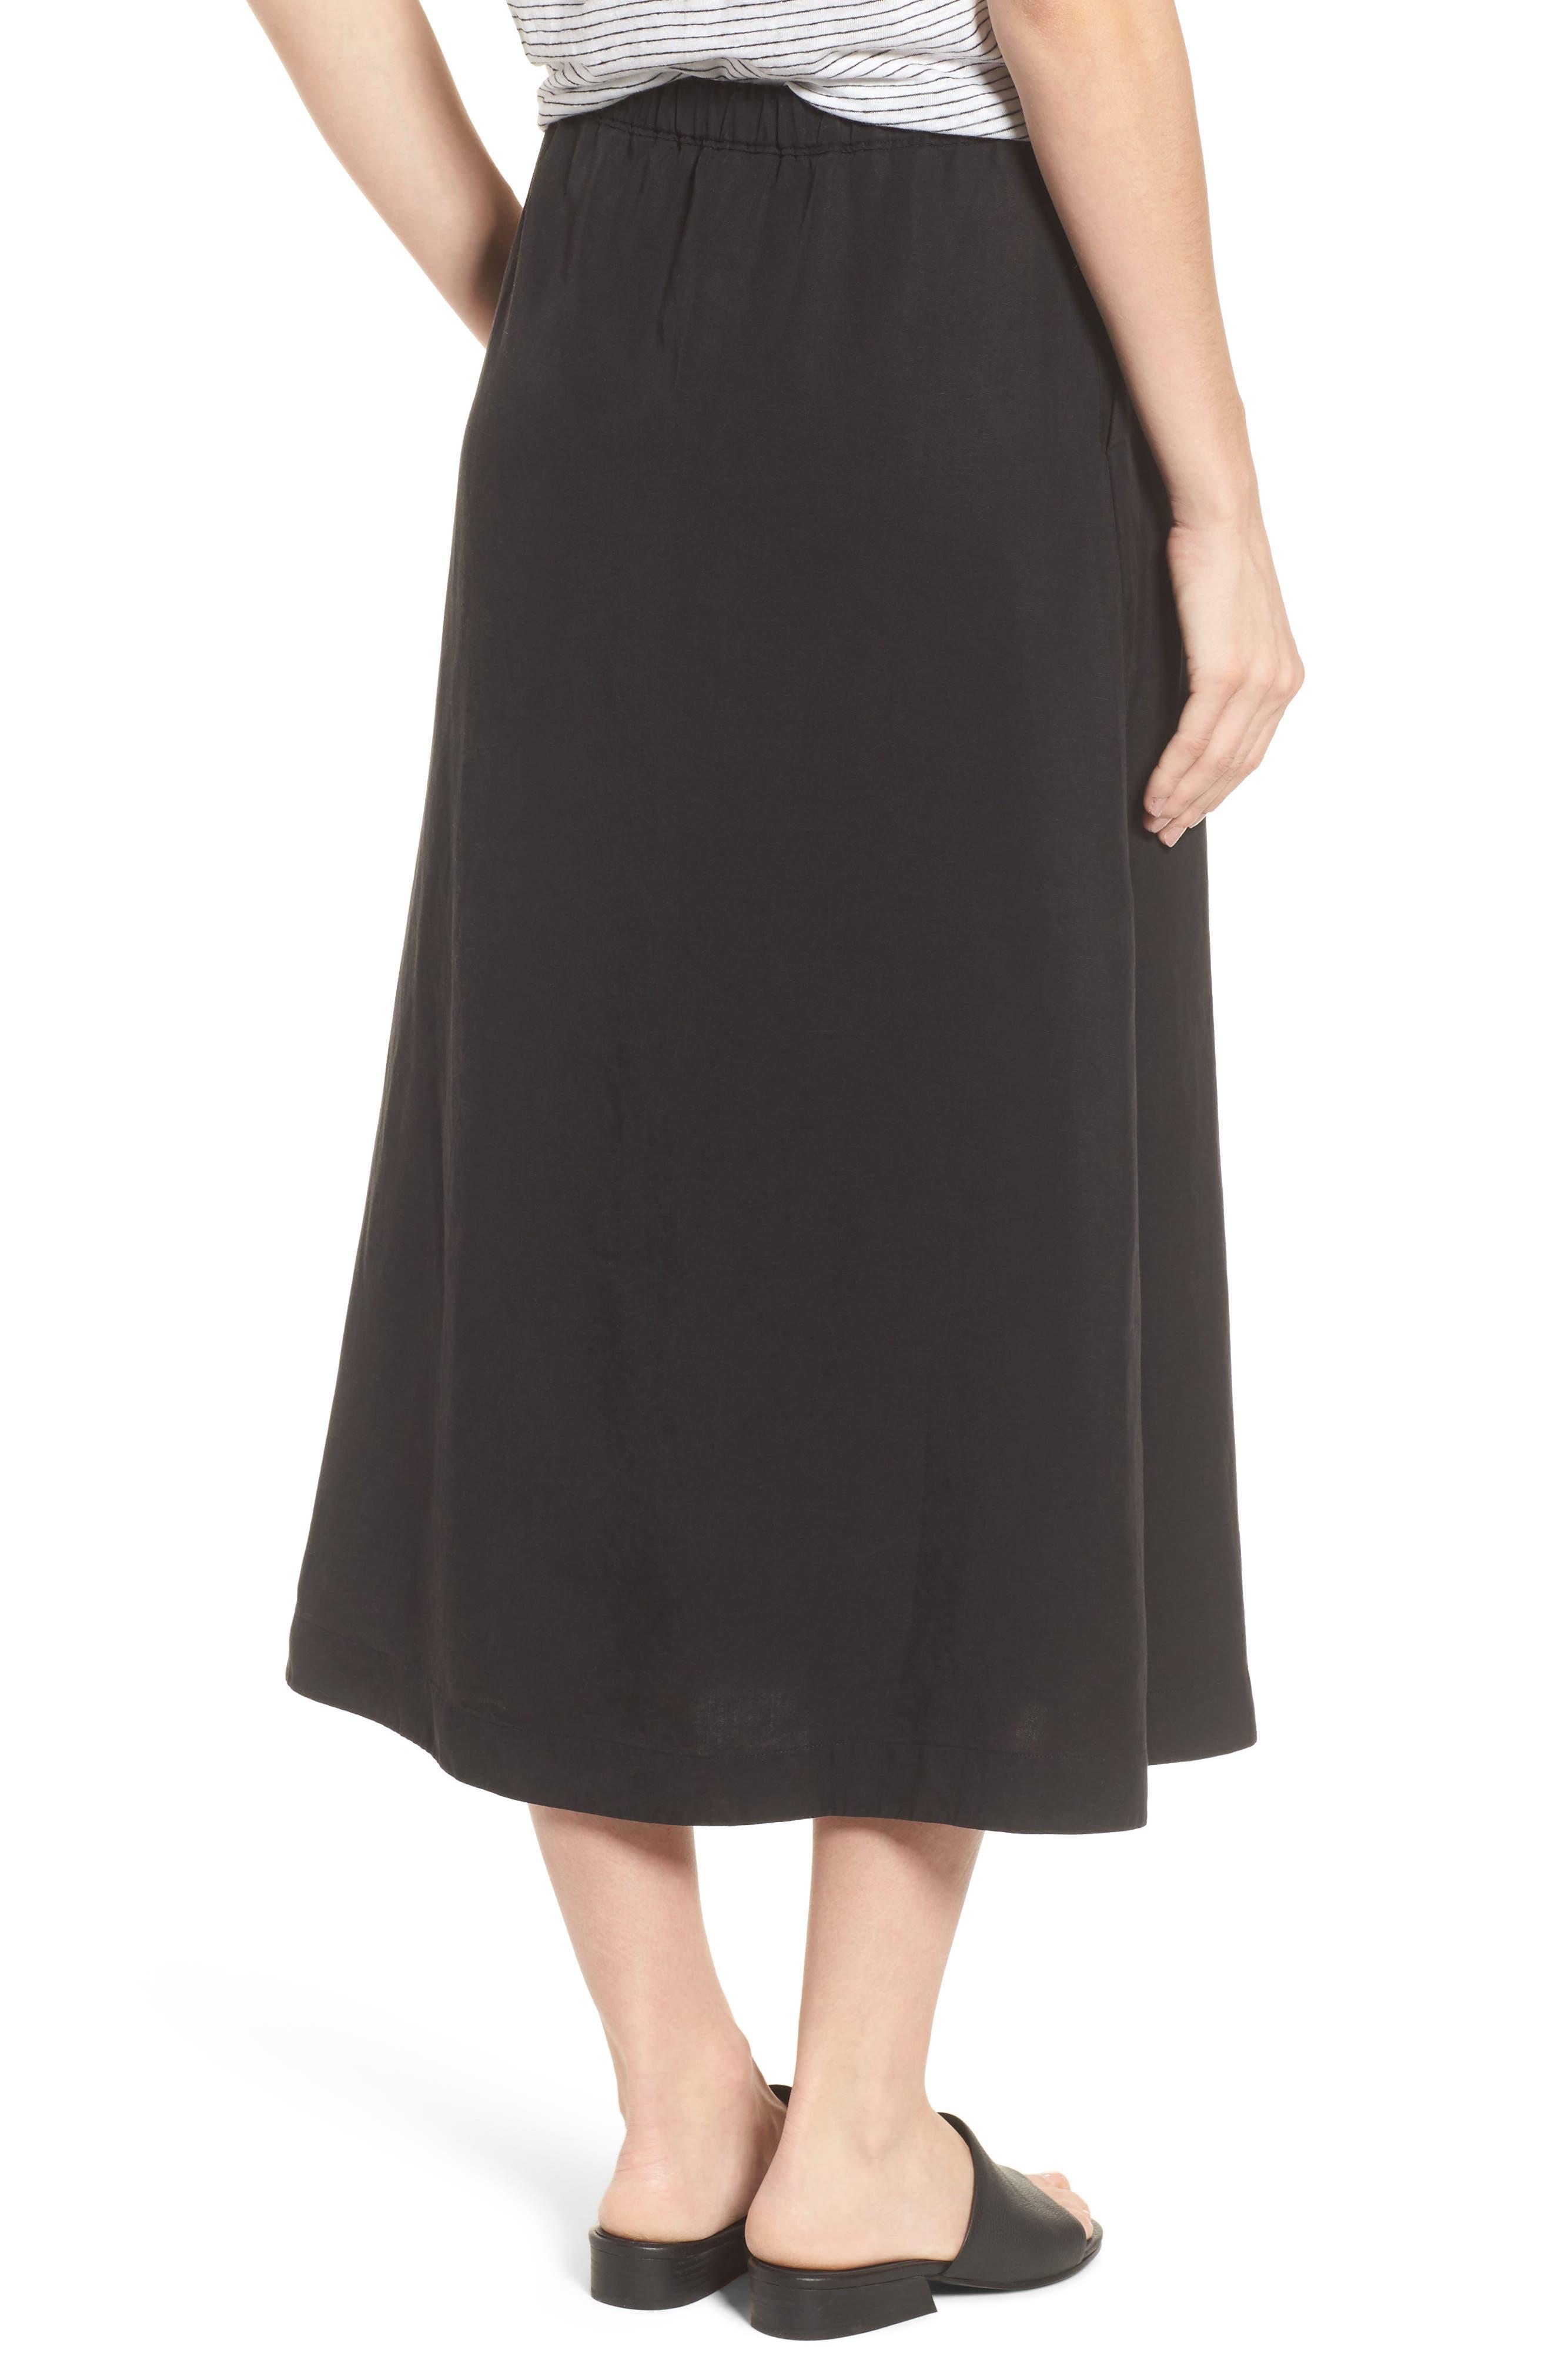 Tencel<sup>®</sup> Lyocell & Linen Midi Skirt,                             Alternate thumbnail 2, color,                             Black